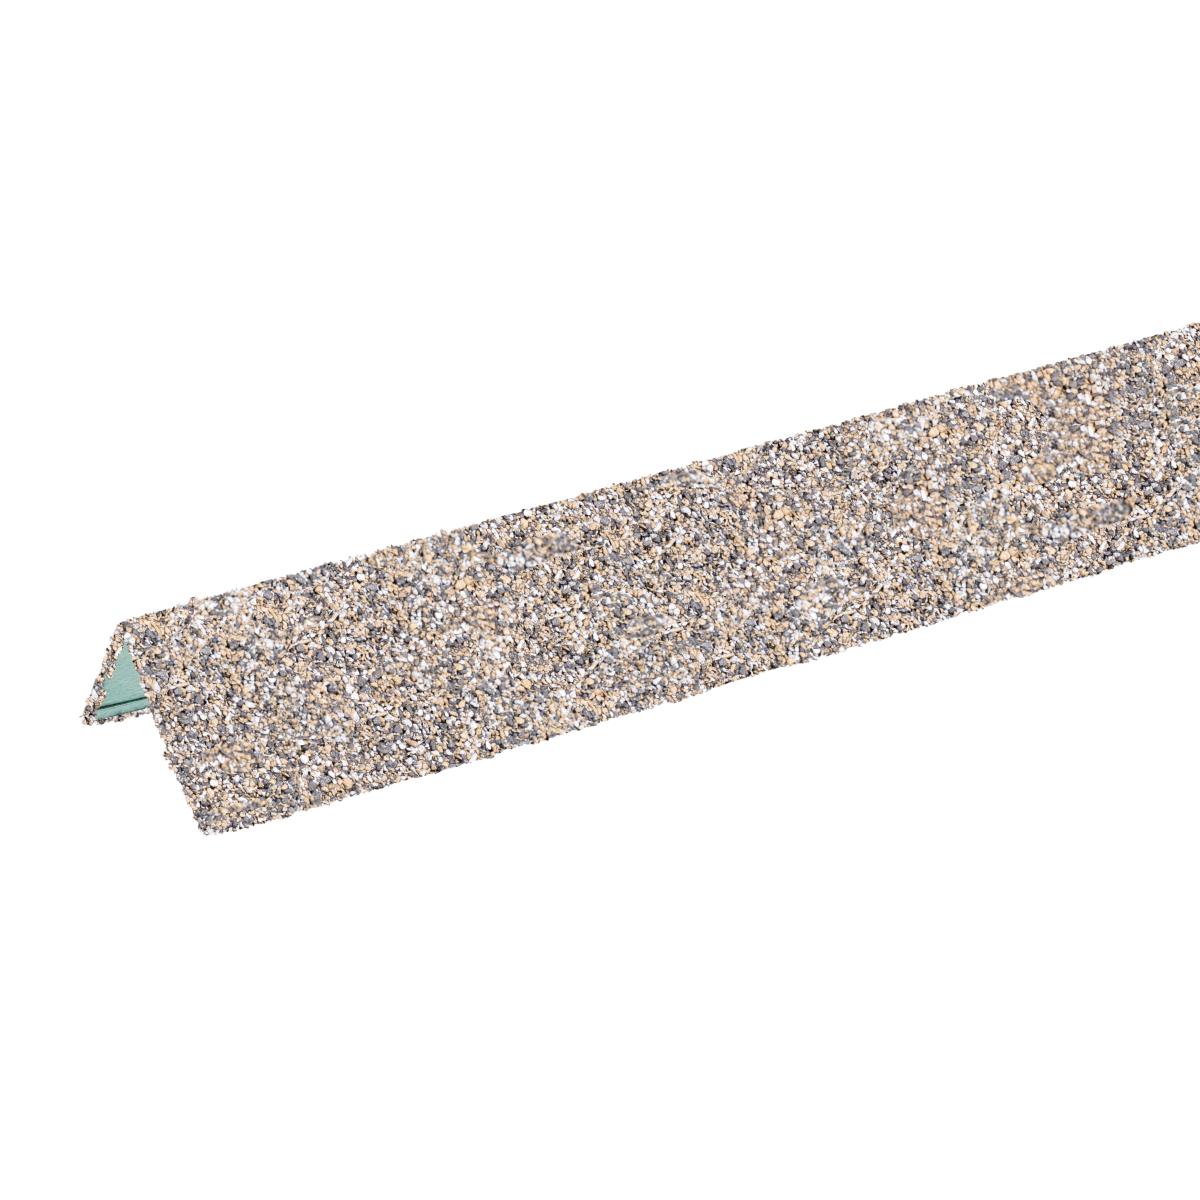 Угол металлический внешний ТН Hauberk серо-бежевый